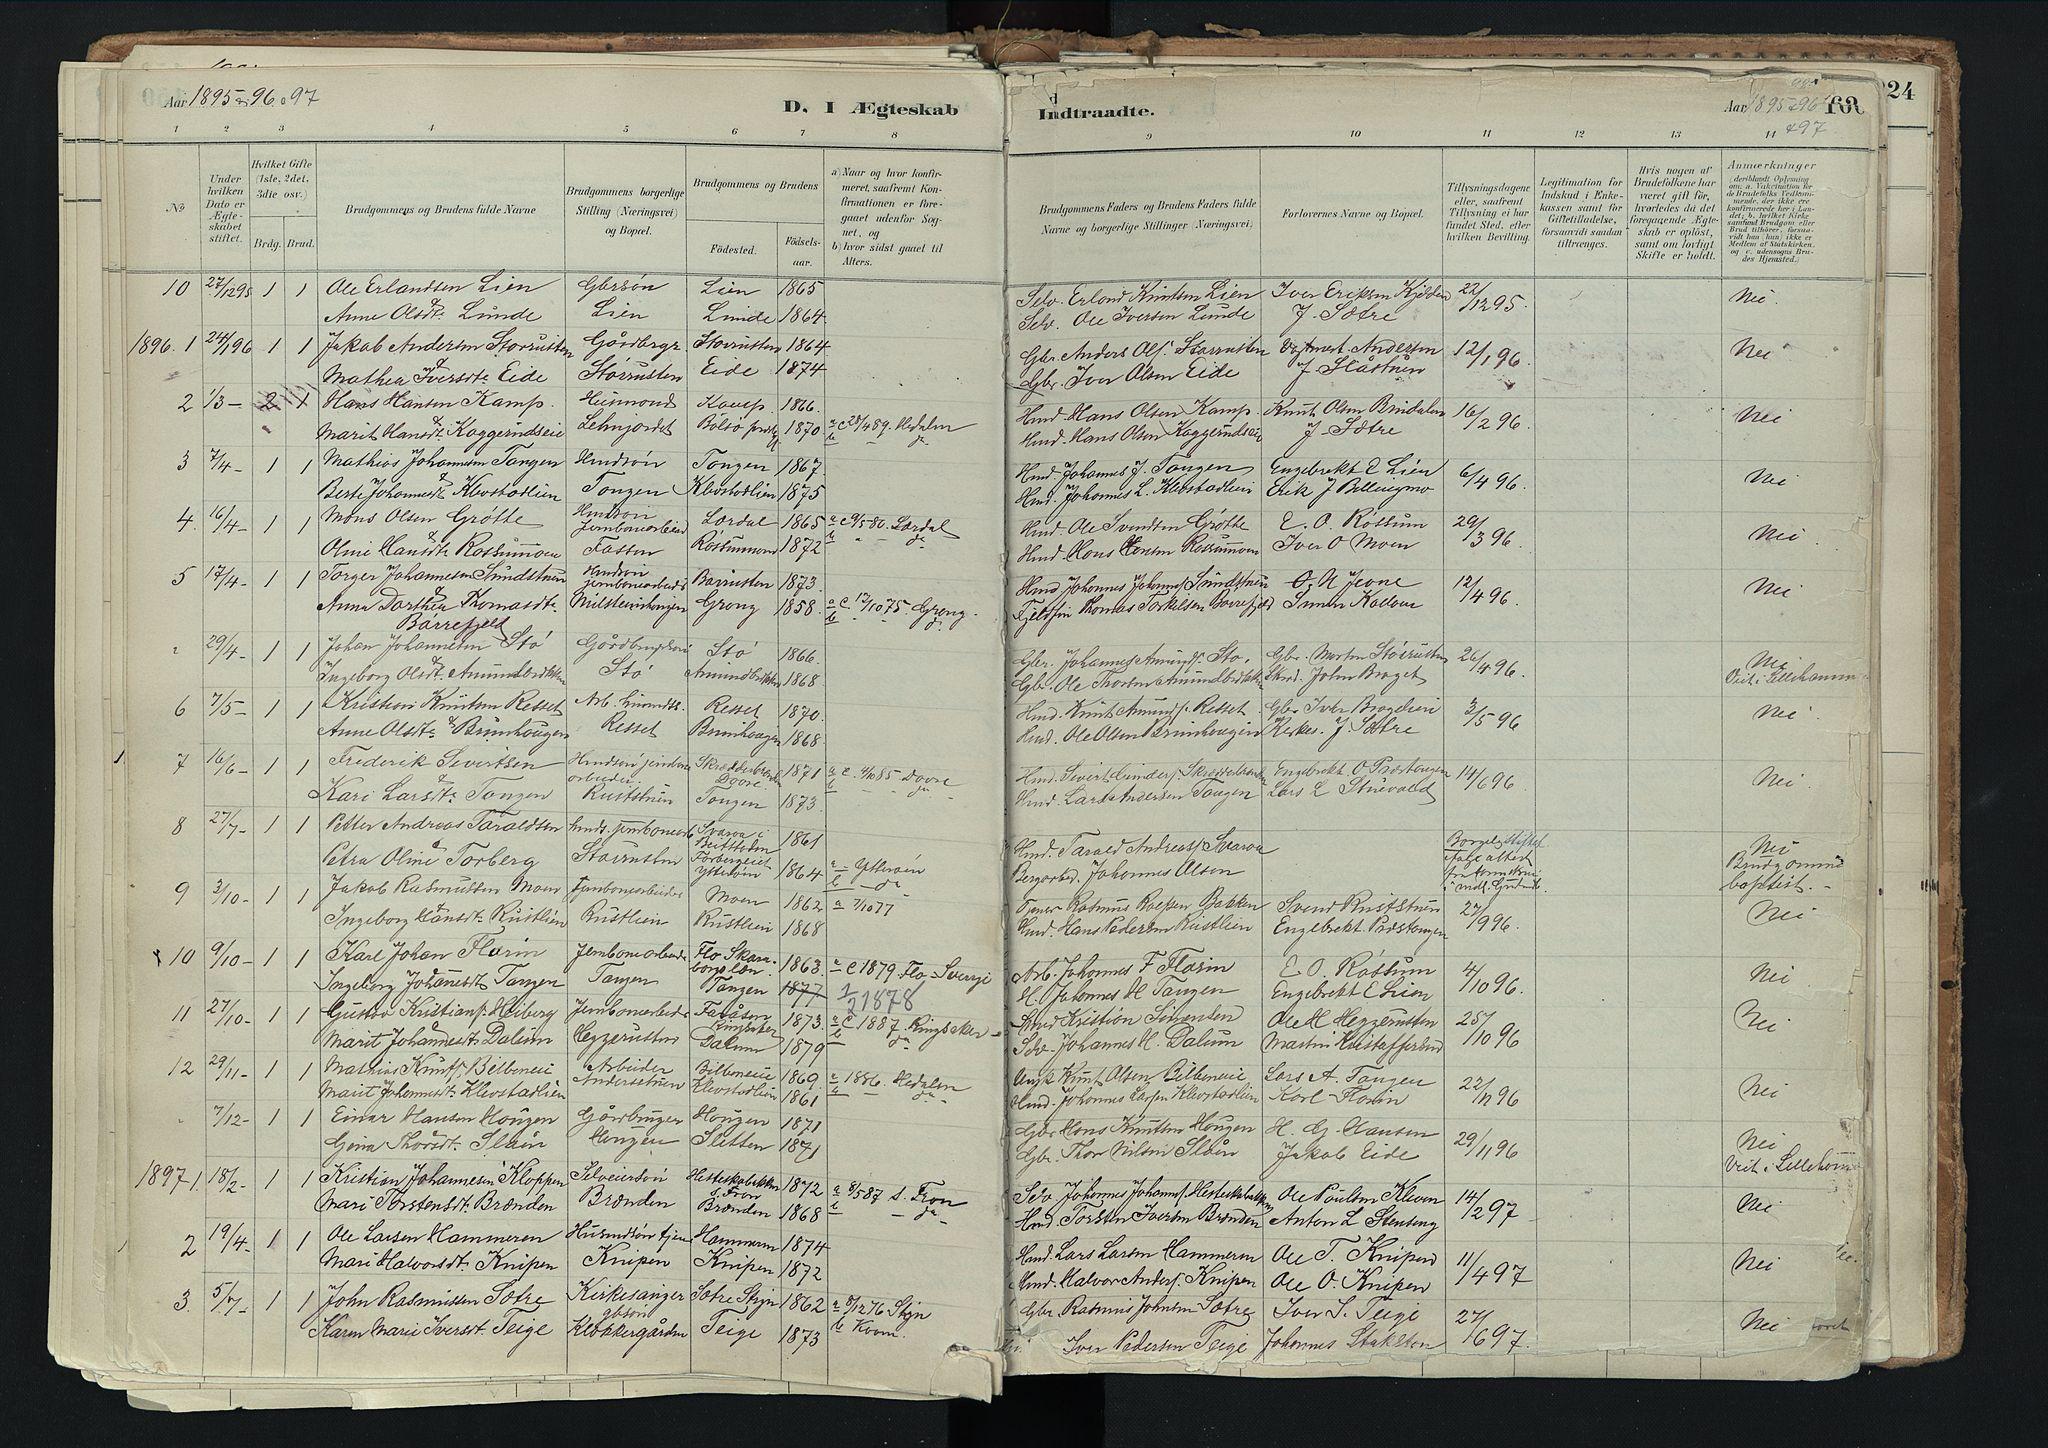 SAH, Nord-Fron prestekontor, Ministerialbok nr. 3, 1884-1914, s. 160